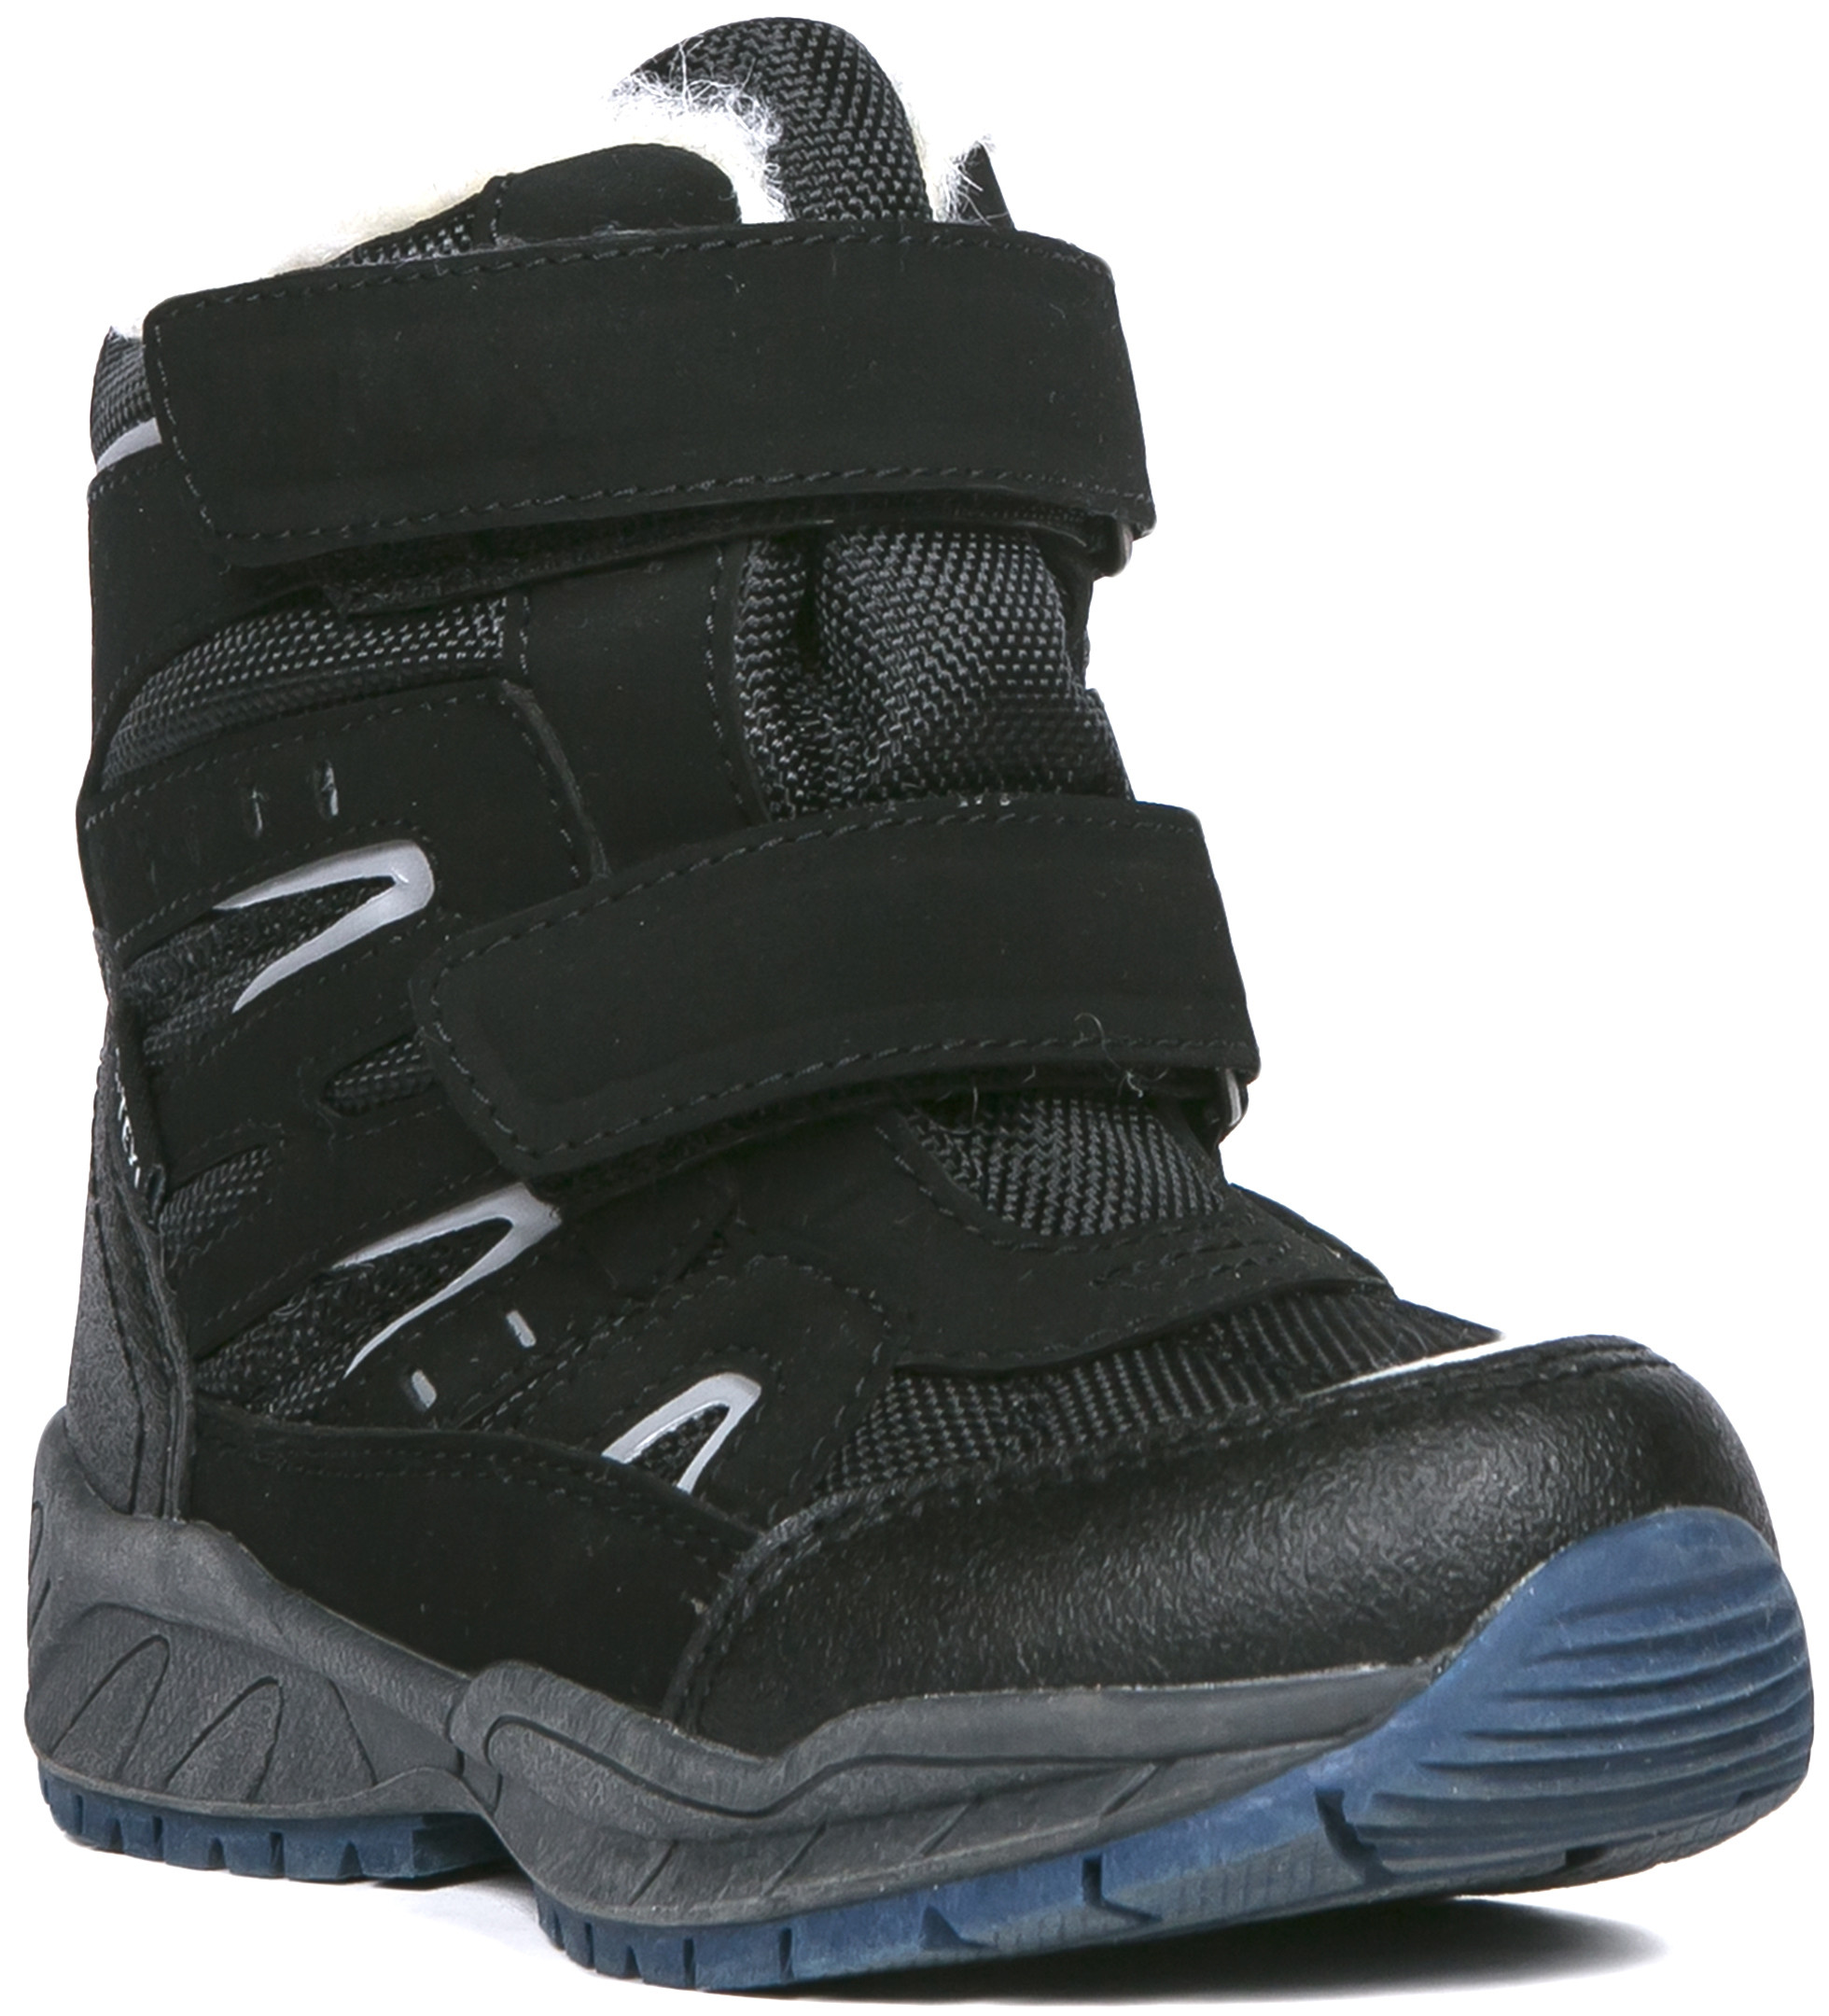 Ботинки и полуботинки Barkito Ботинки для мальчика Barkito, черные цена